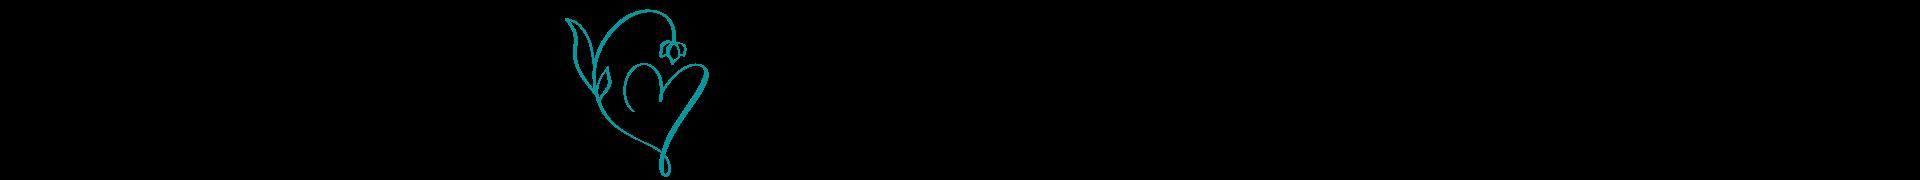 Better lifestyle logo